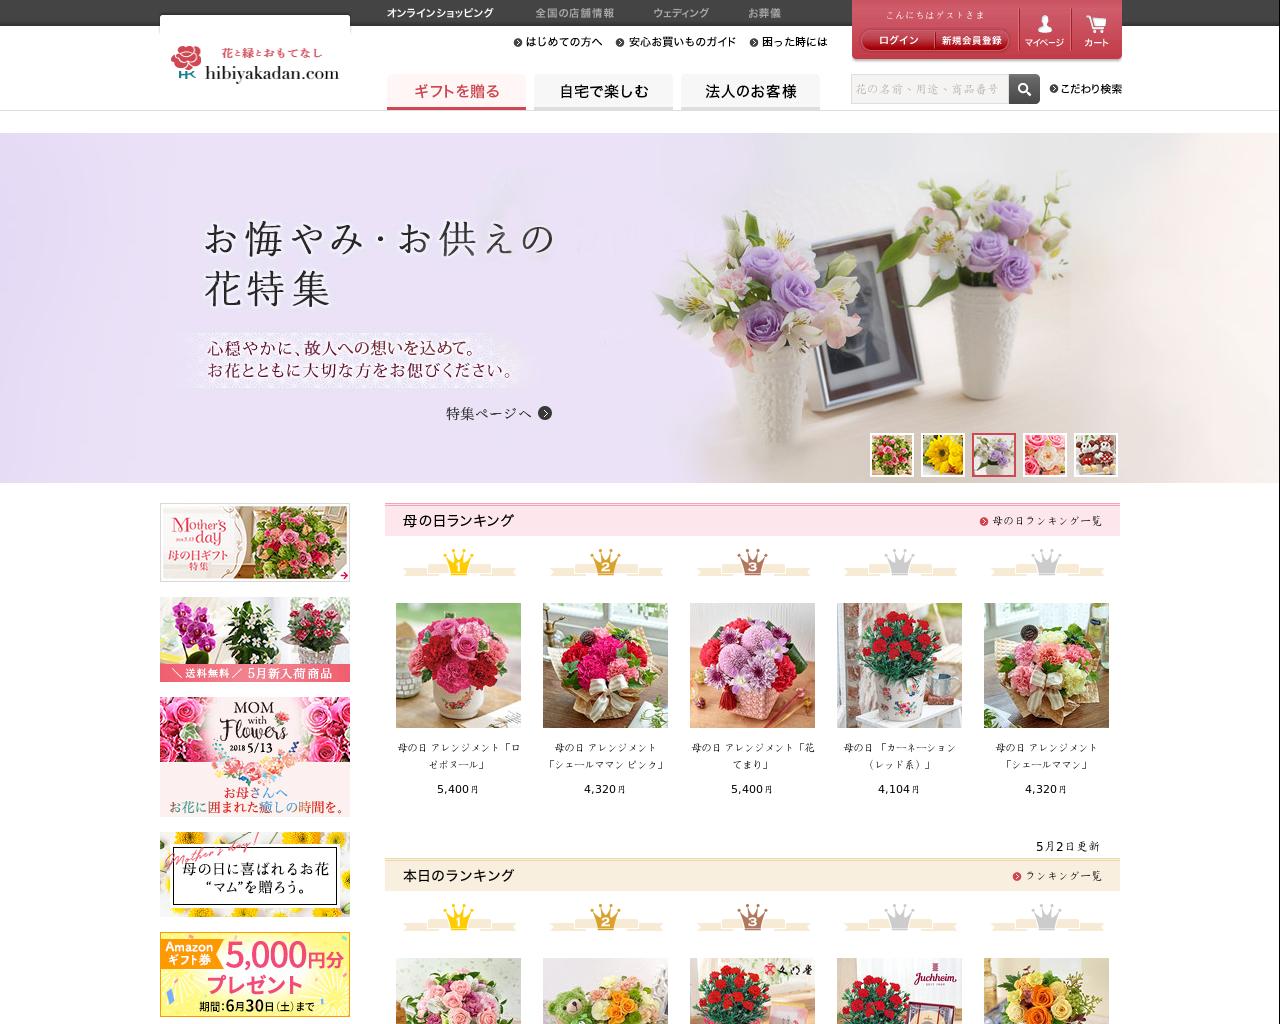 www.hibiyakadan.com(2018/05/02 23:10:49)